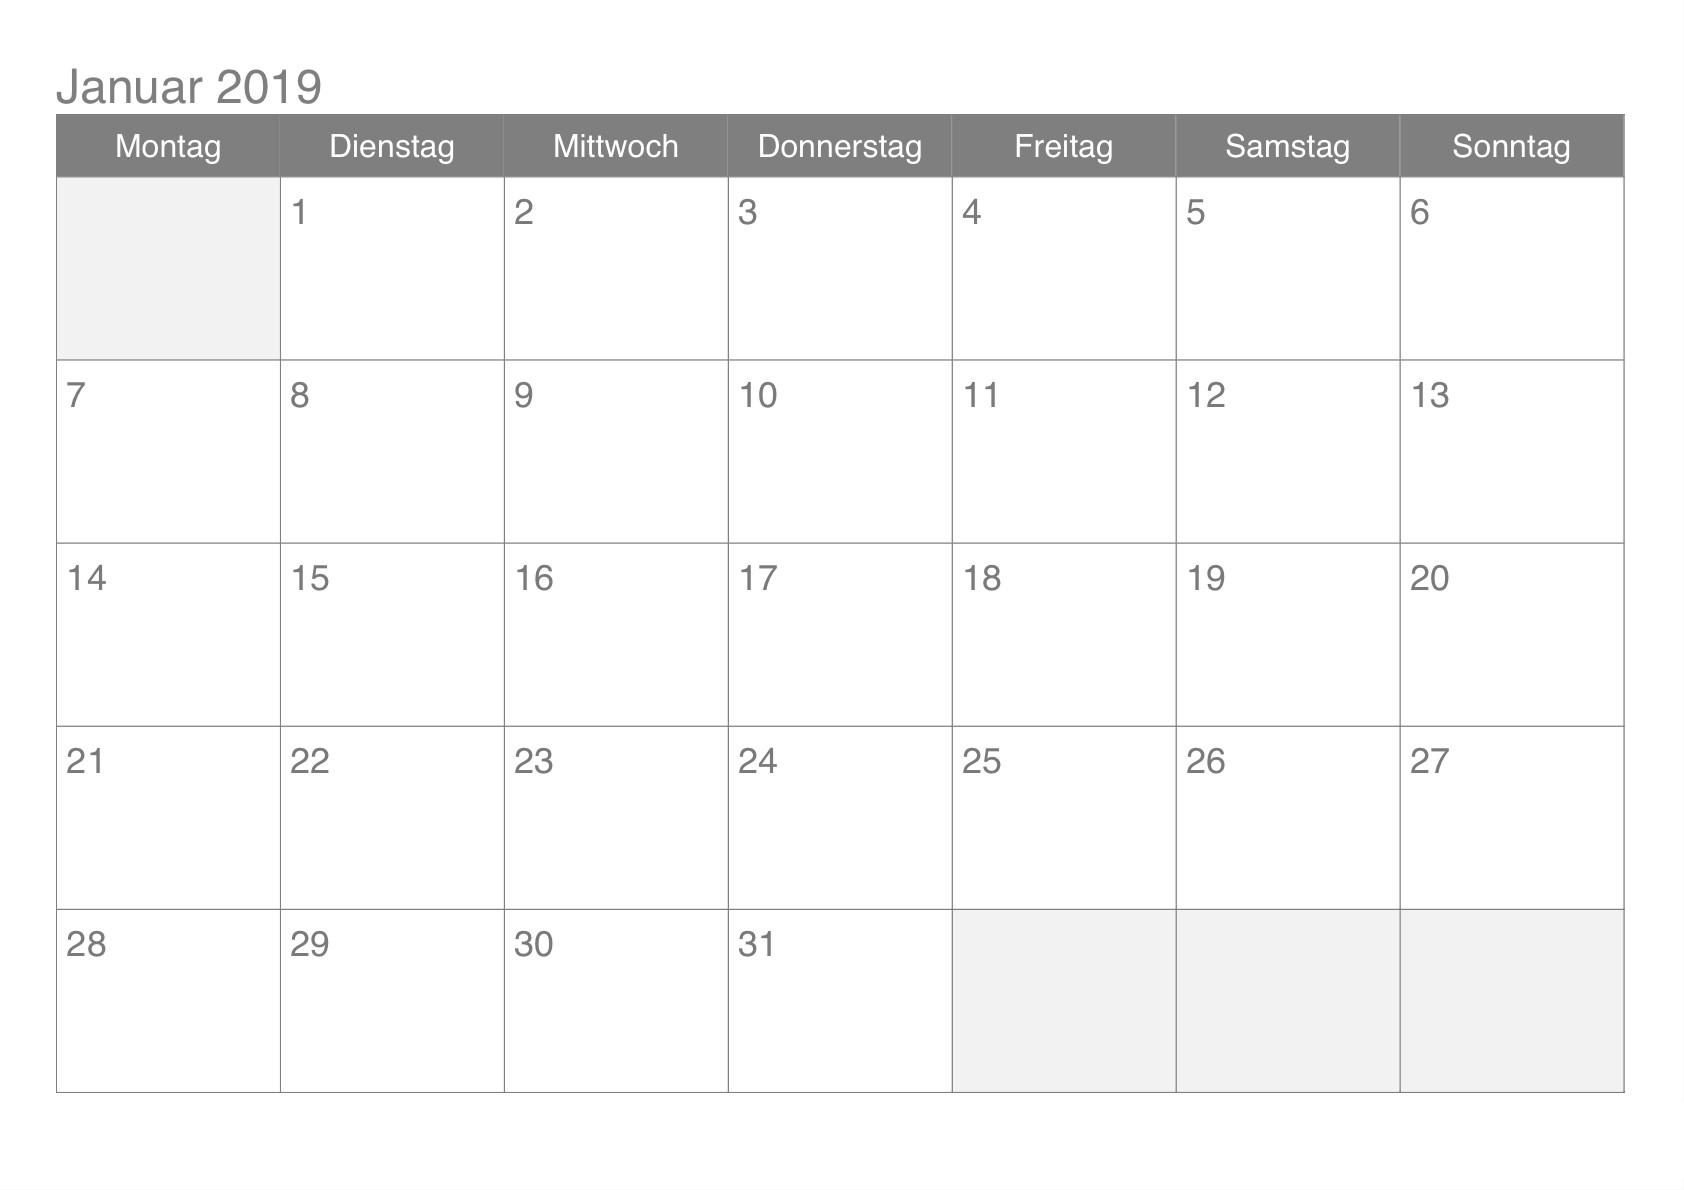 Calendario Anual Festivos 2018 Más Caliente 10 Best Calendario Enero 2019 Para Imprimir Images Of Calendario Anual Festivos 2018 Más Arriba-a-fecha Calendario En Latin